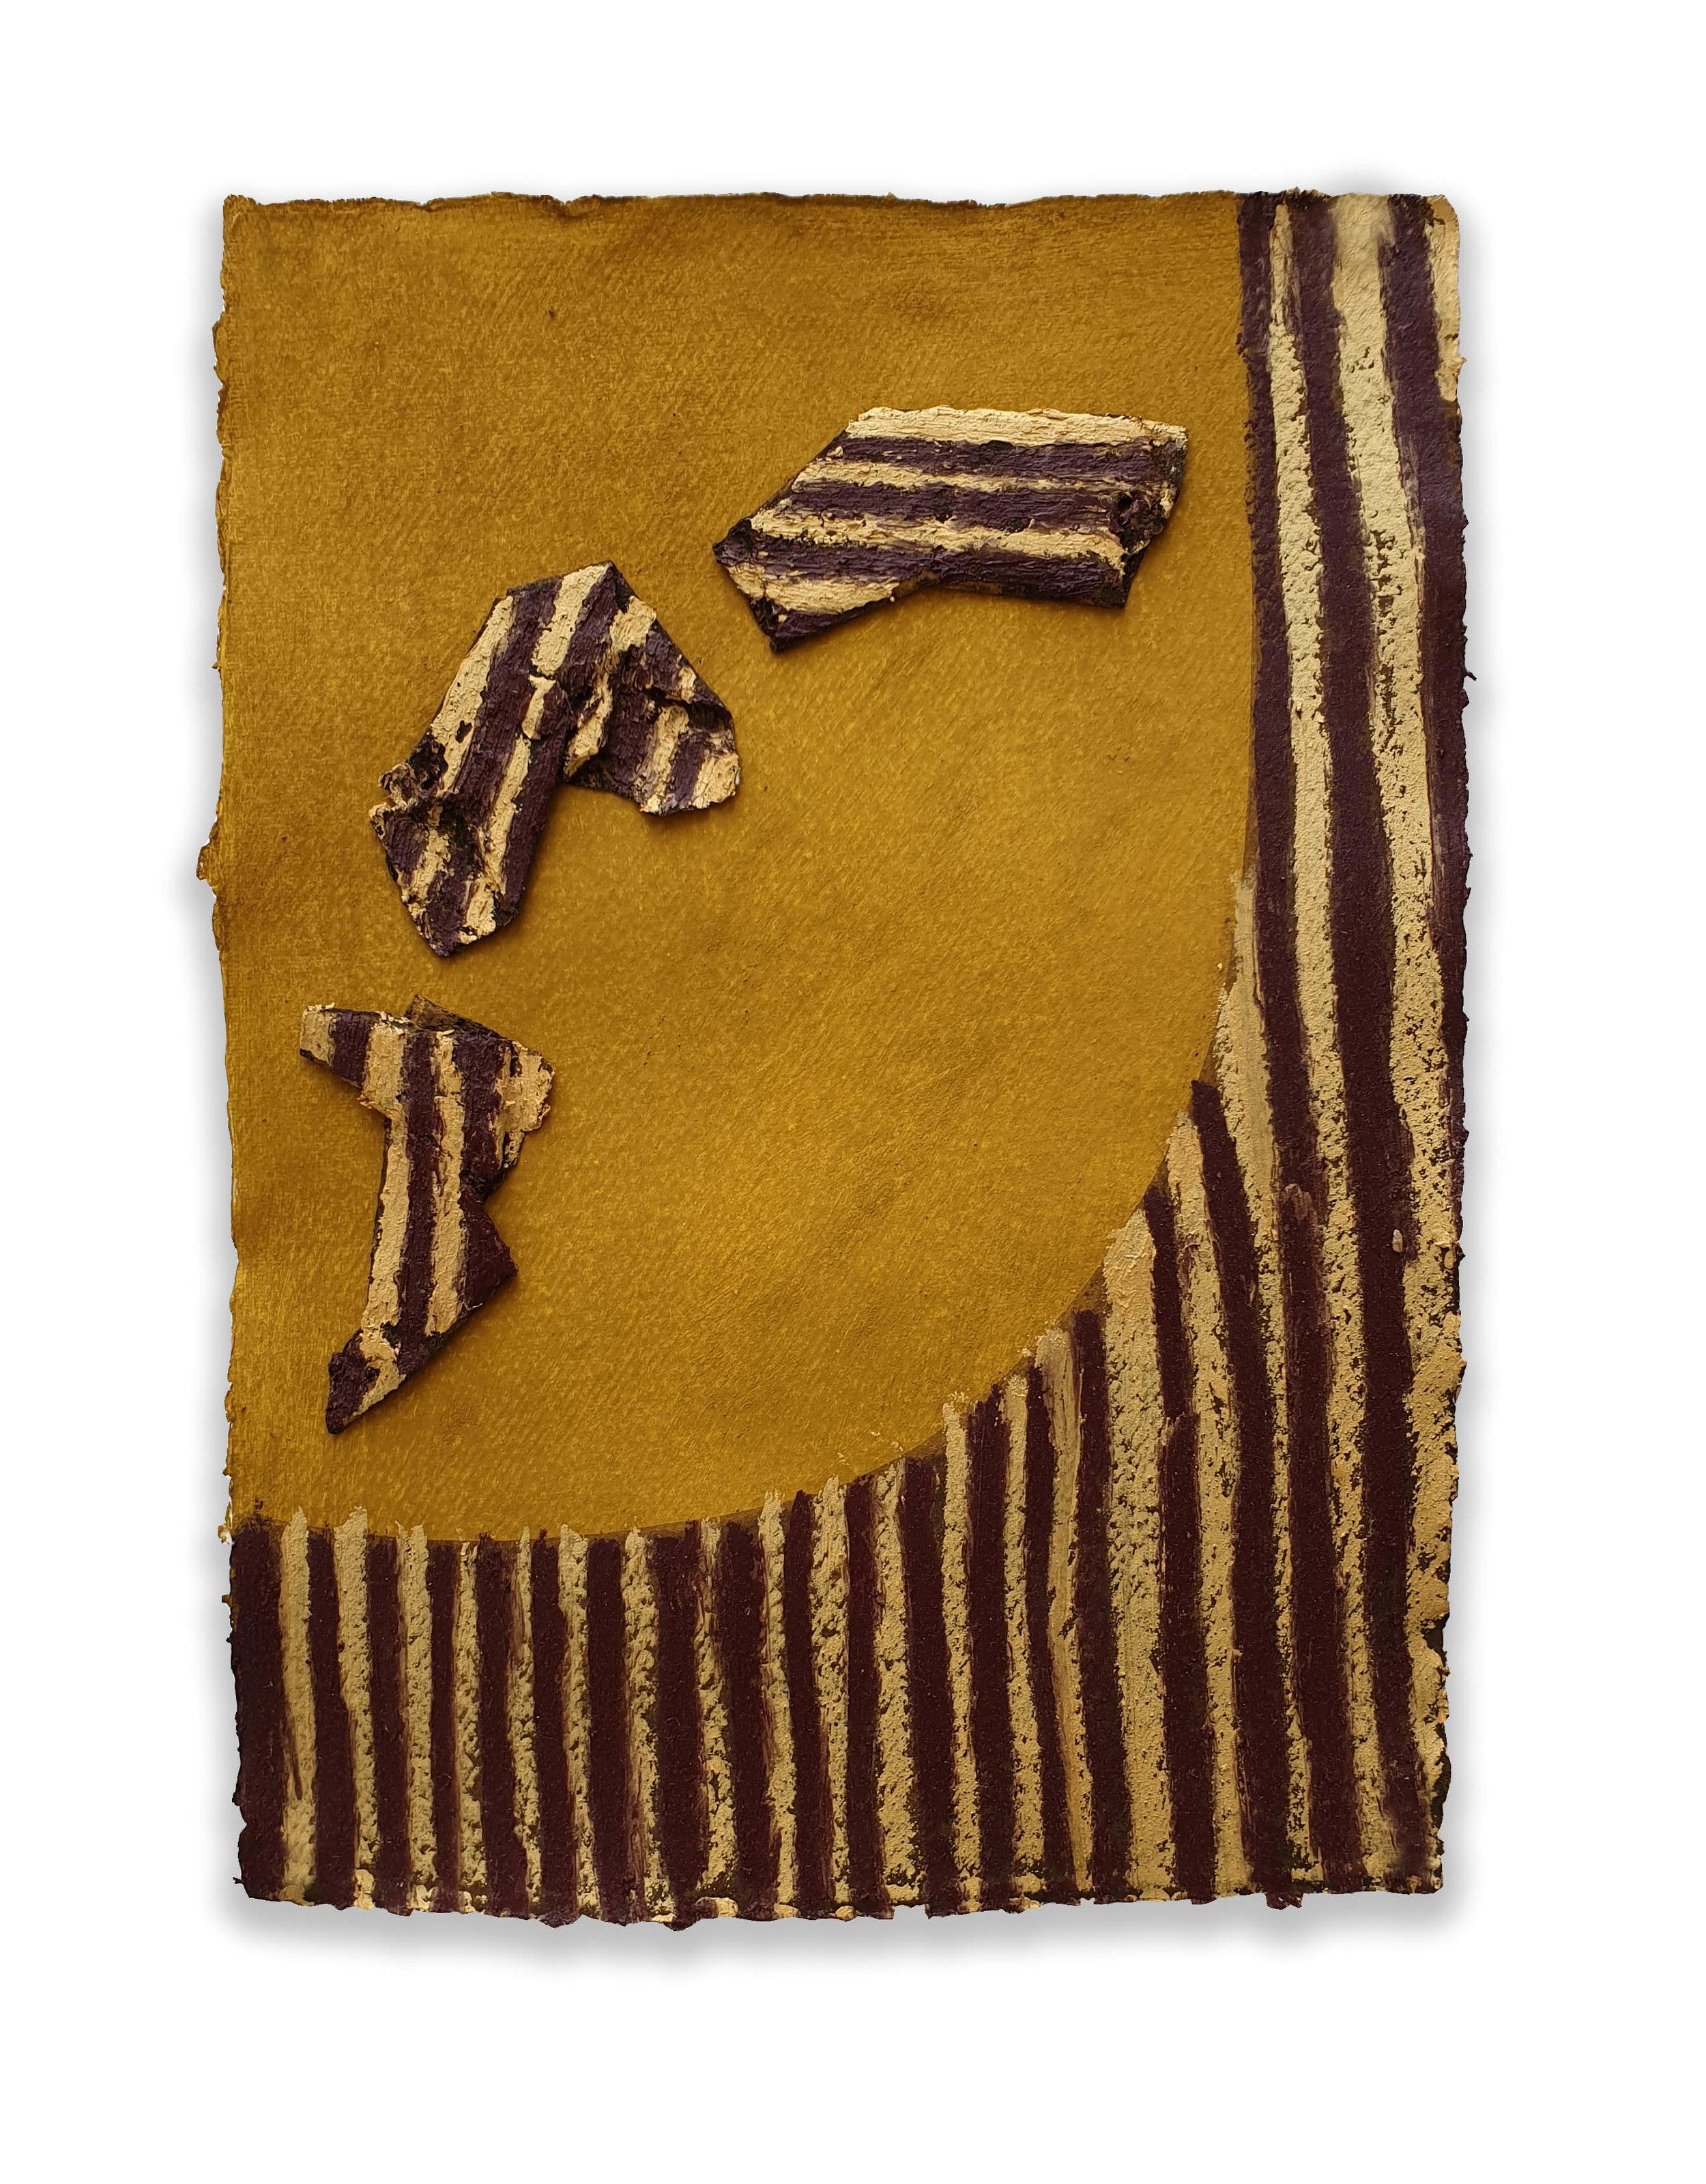 Flusso Bizantino  - 2019  Acrylic pigment and oil stick on paper   43 x 30 cm